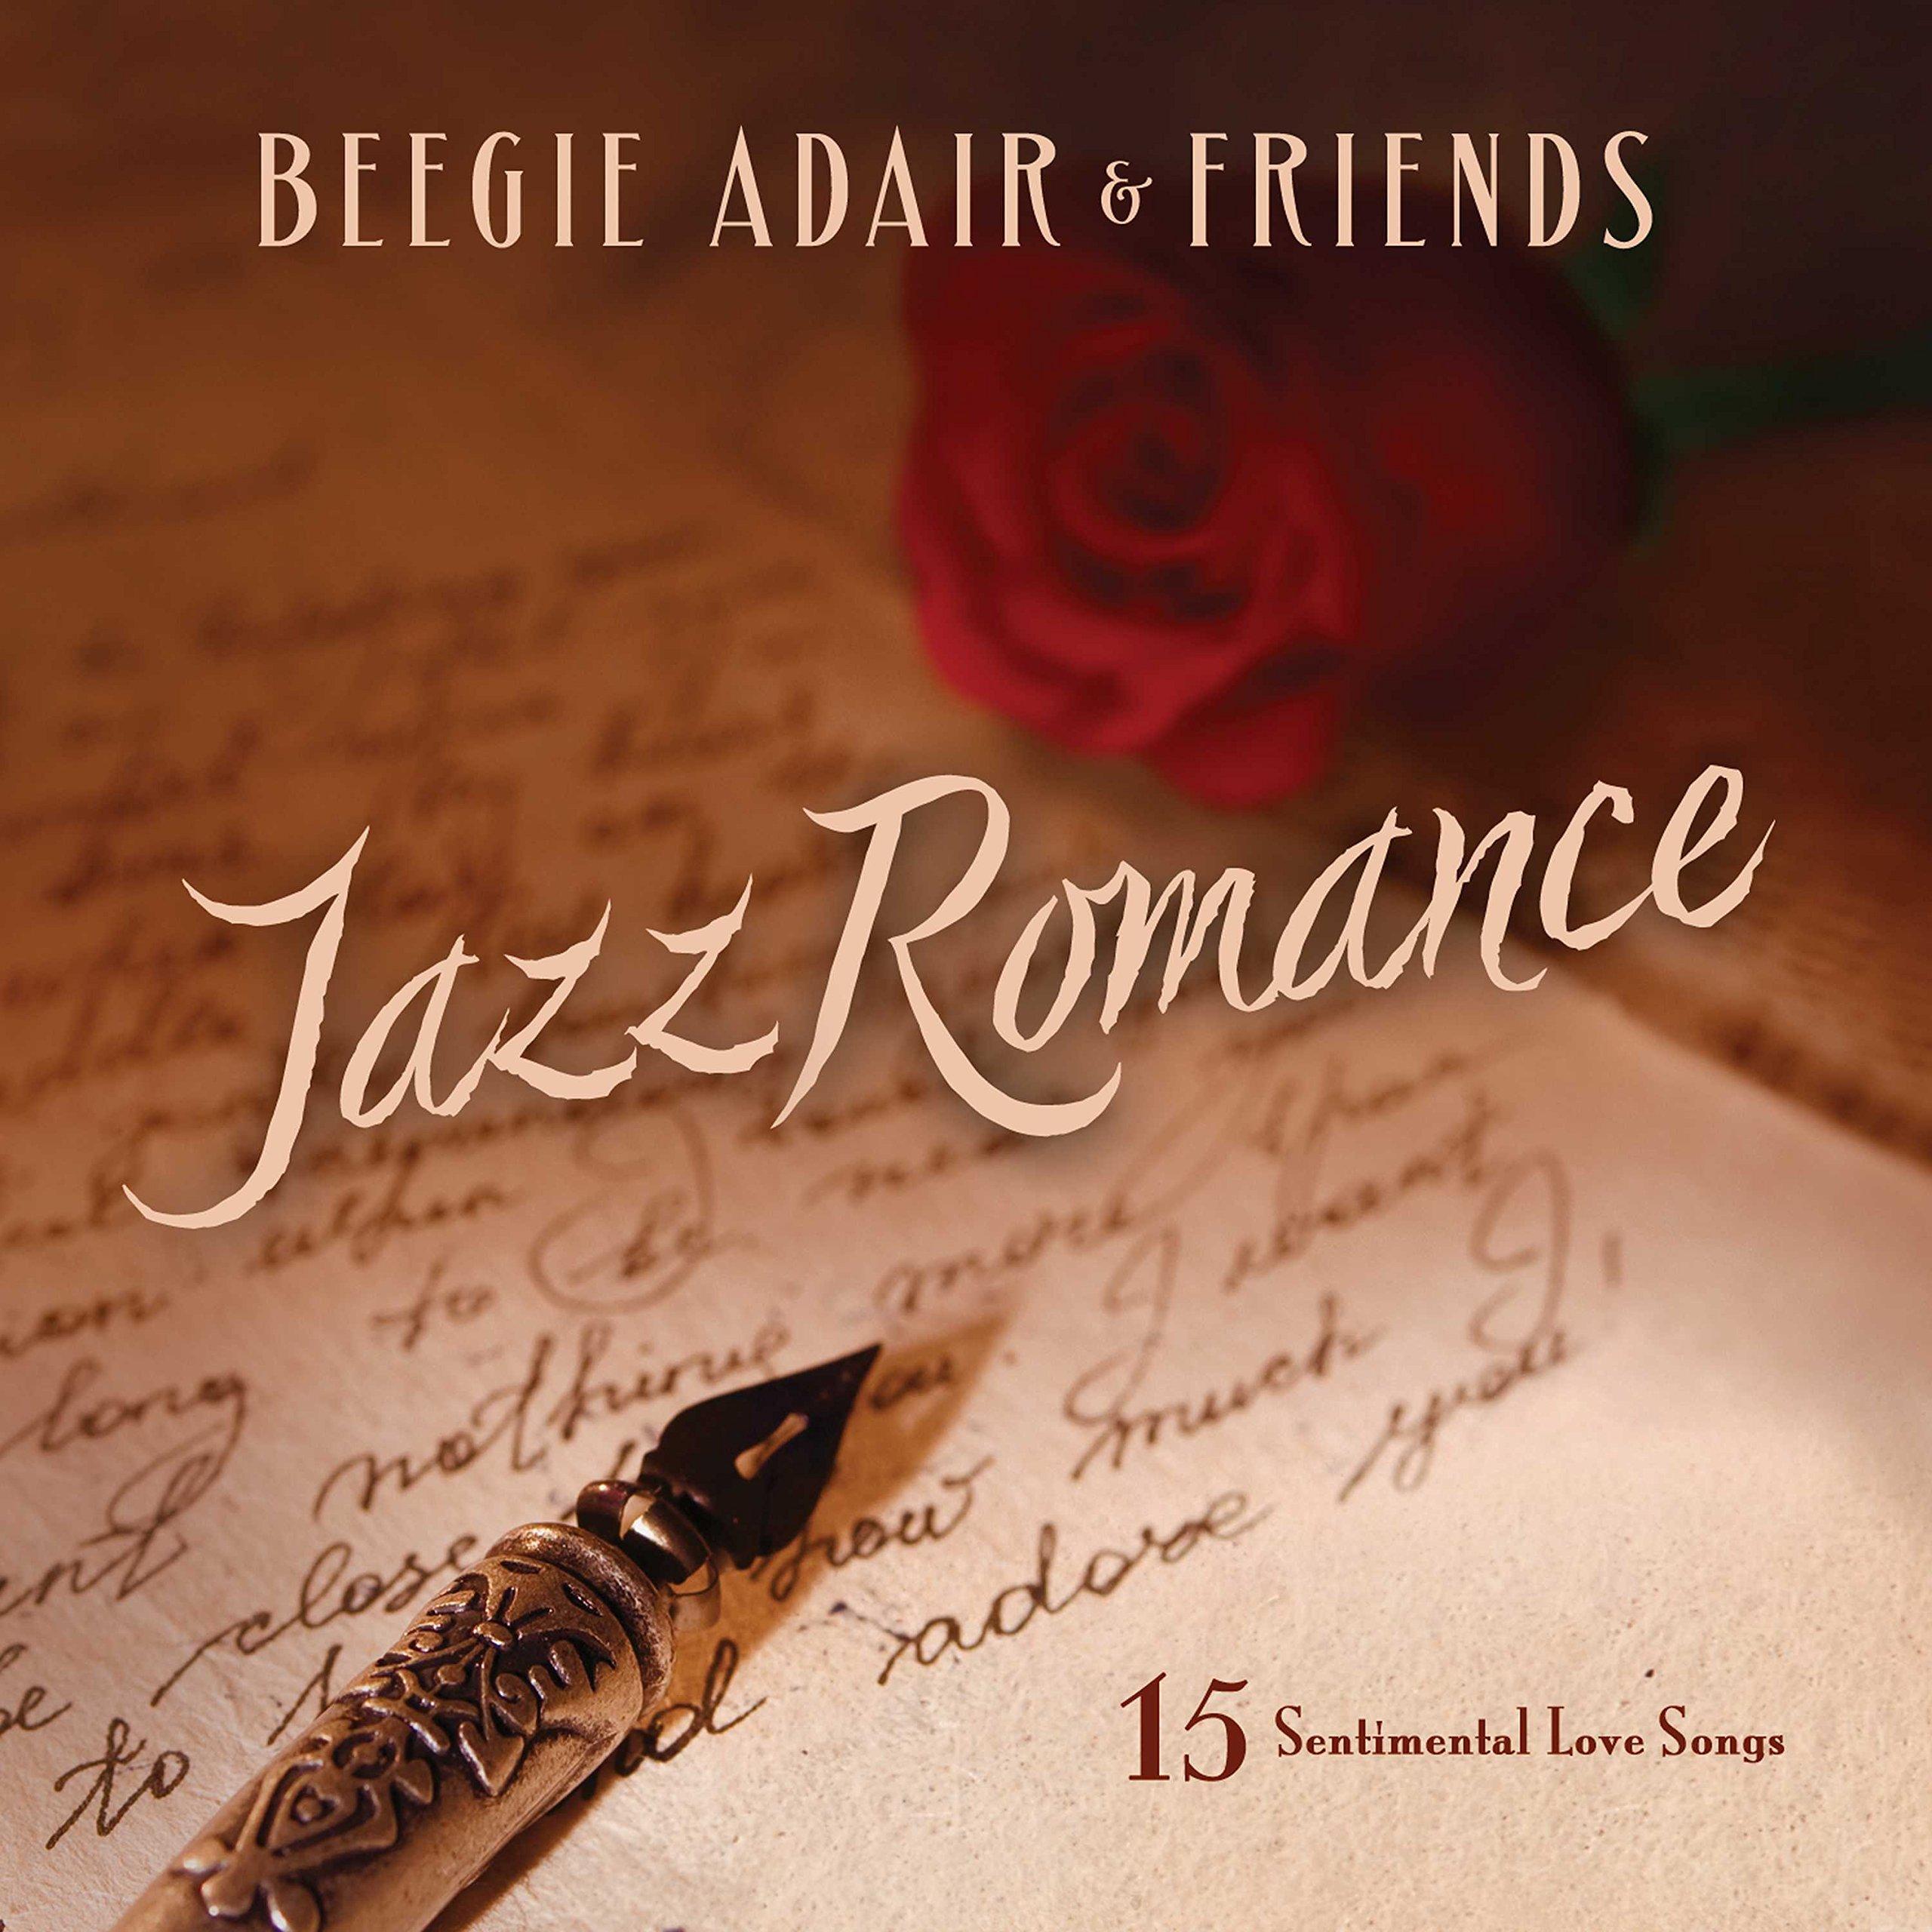 CD : Beegie Adair - Jazz Romance - A Beegie Adair Collection